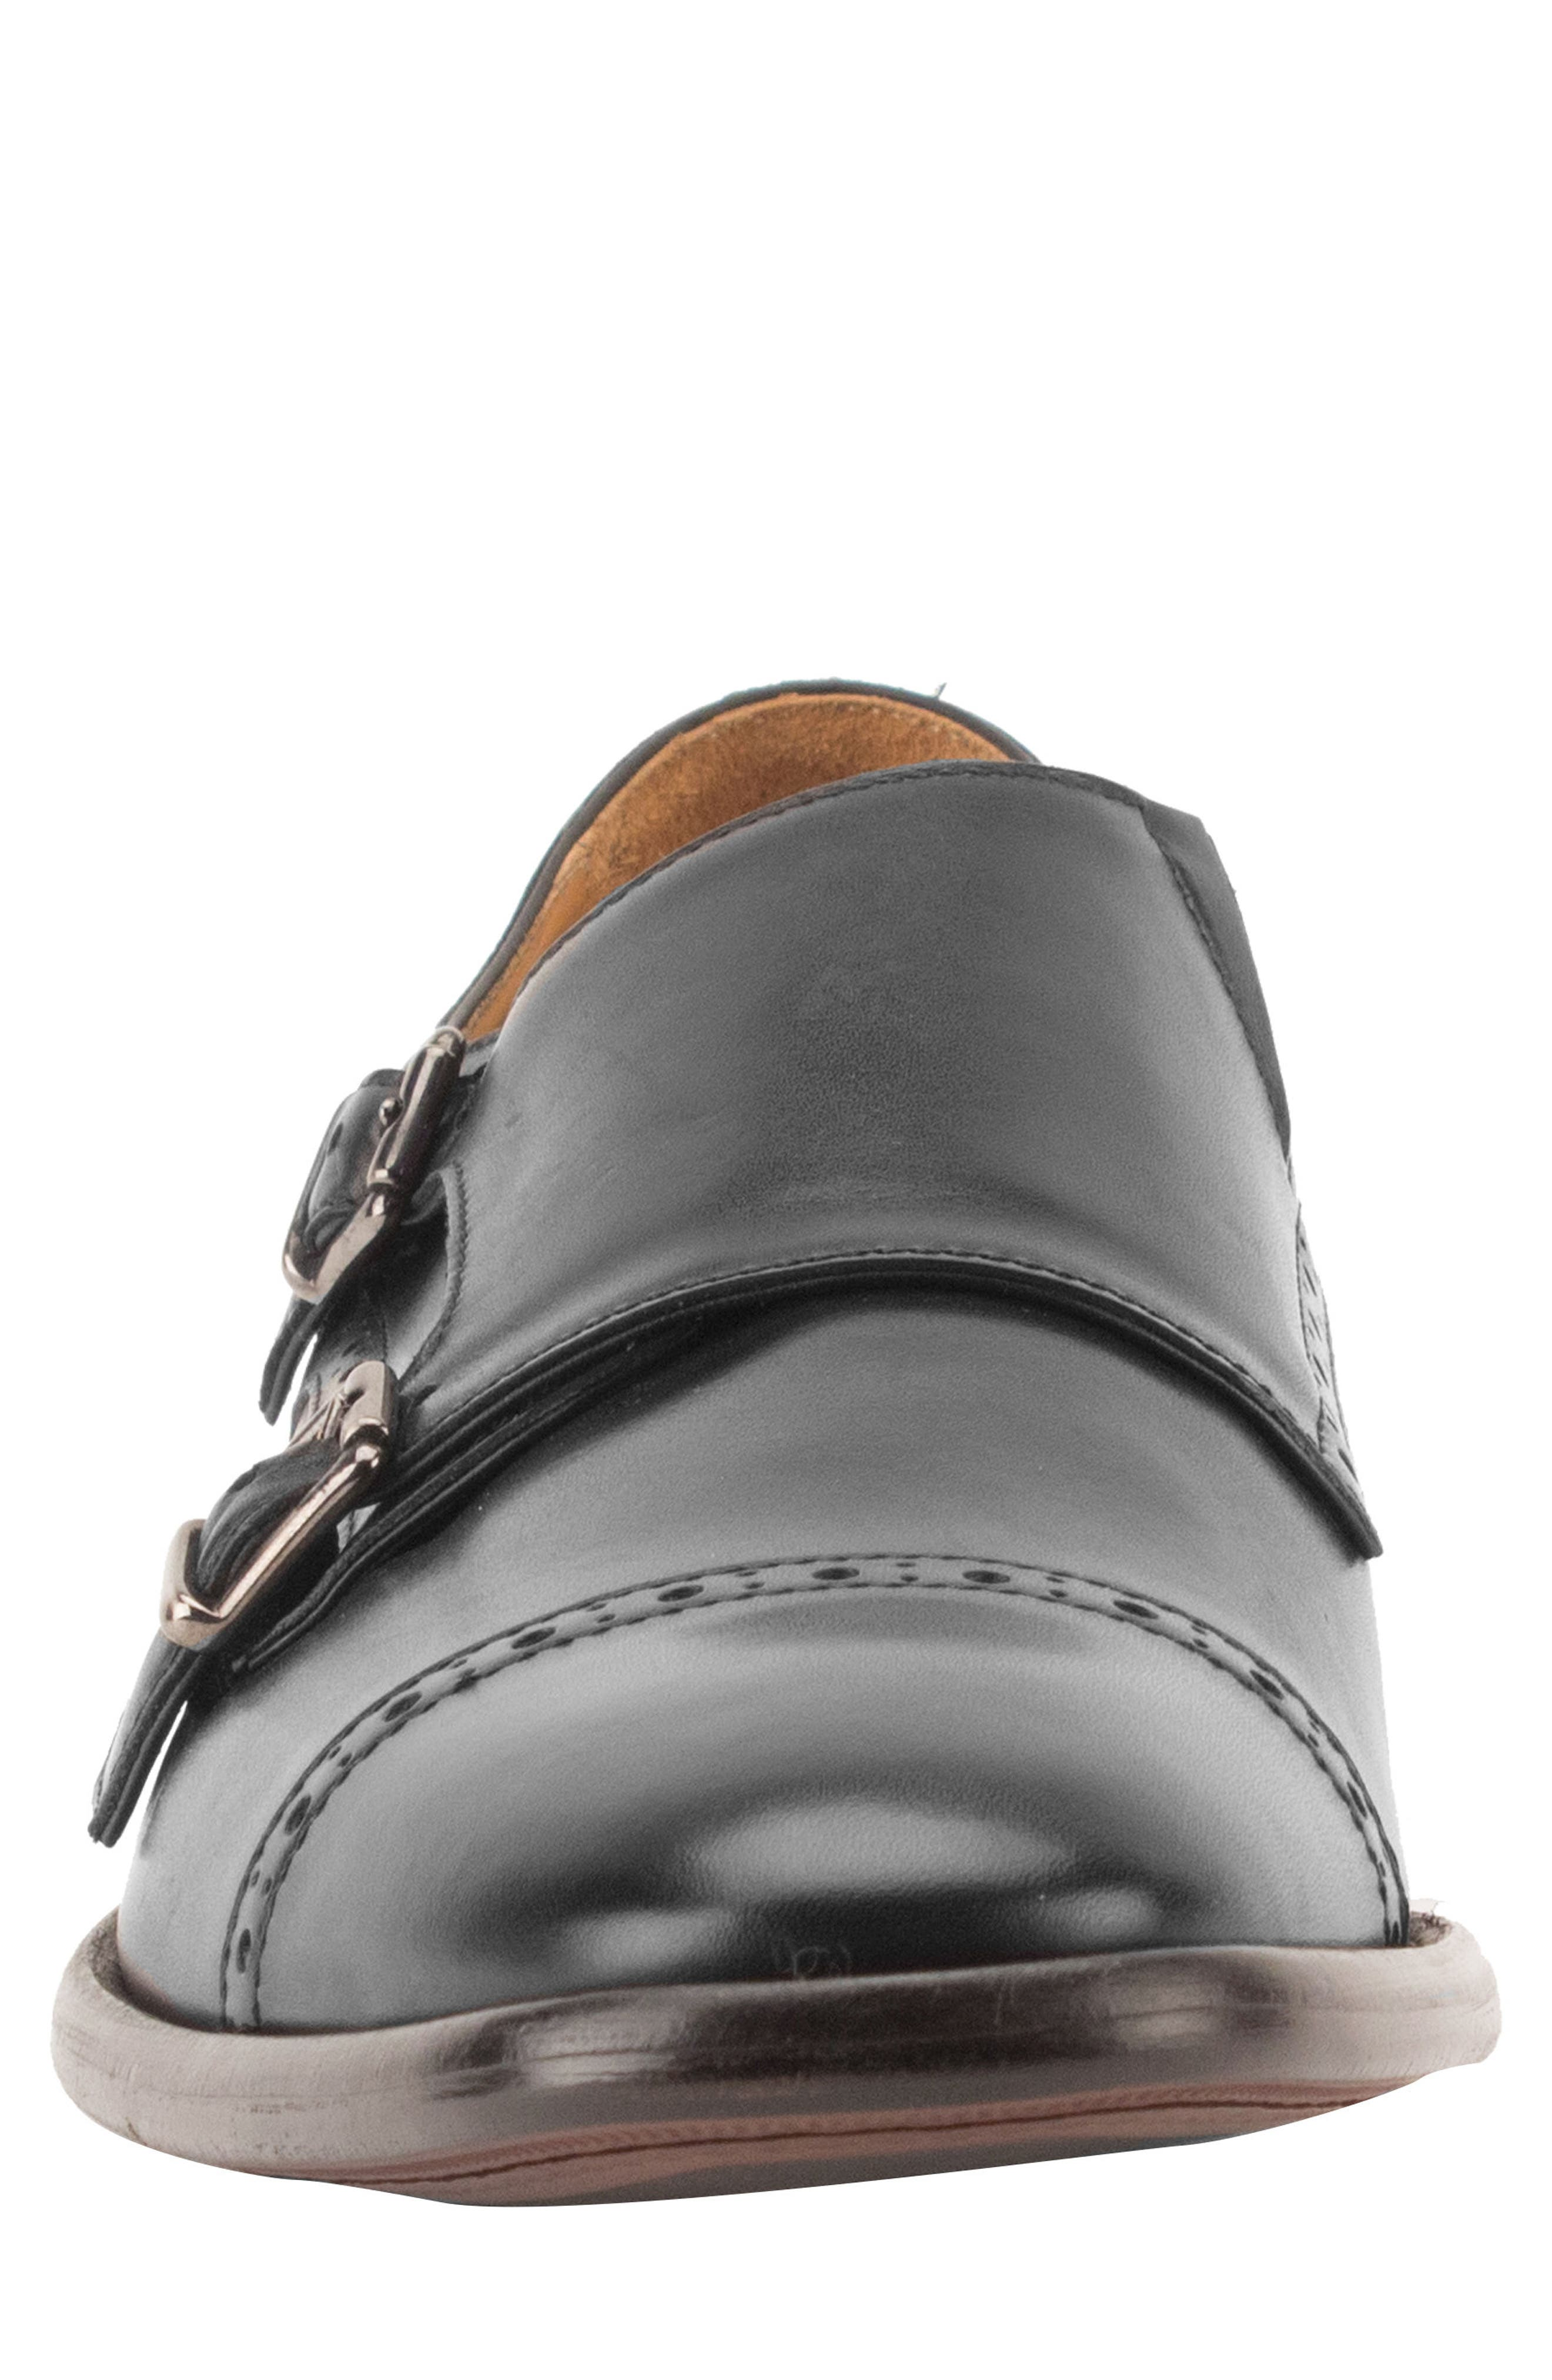 Corbett Cap Toe Double Strap Monk Shoe,                             Alternate thumbnail 4, color,                             Black Leather